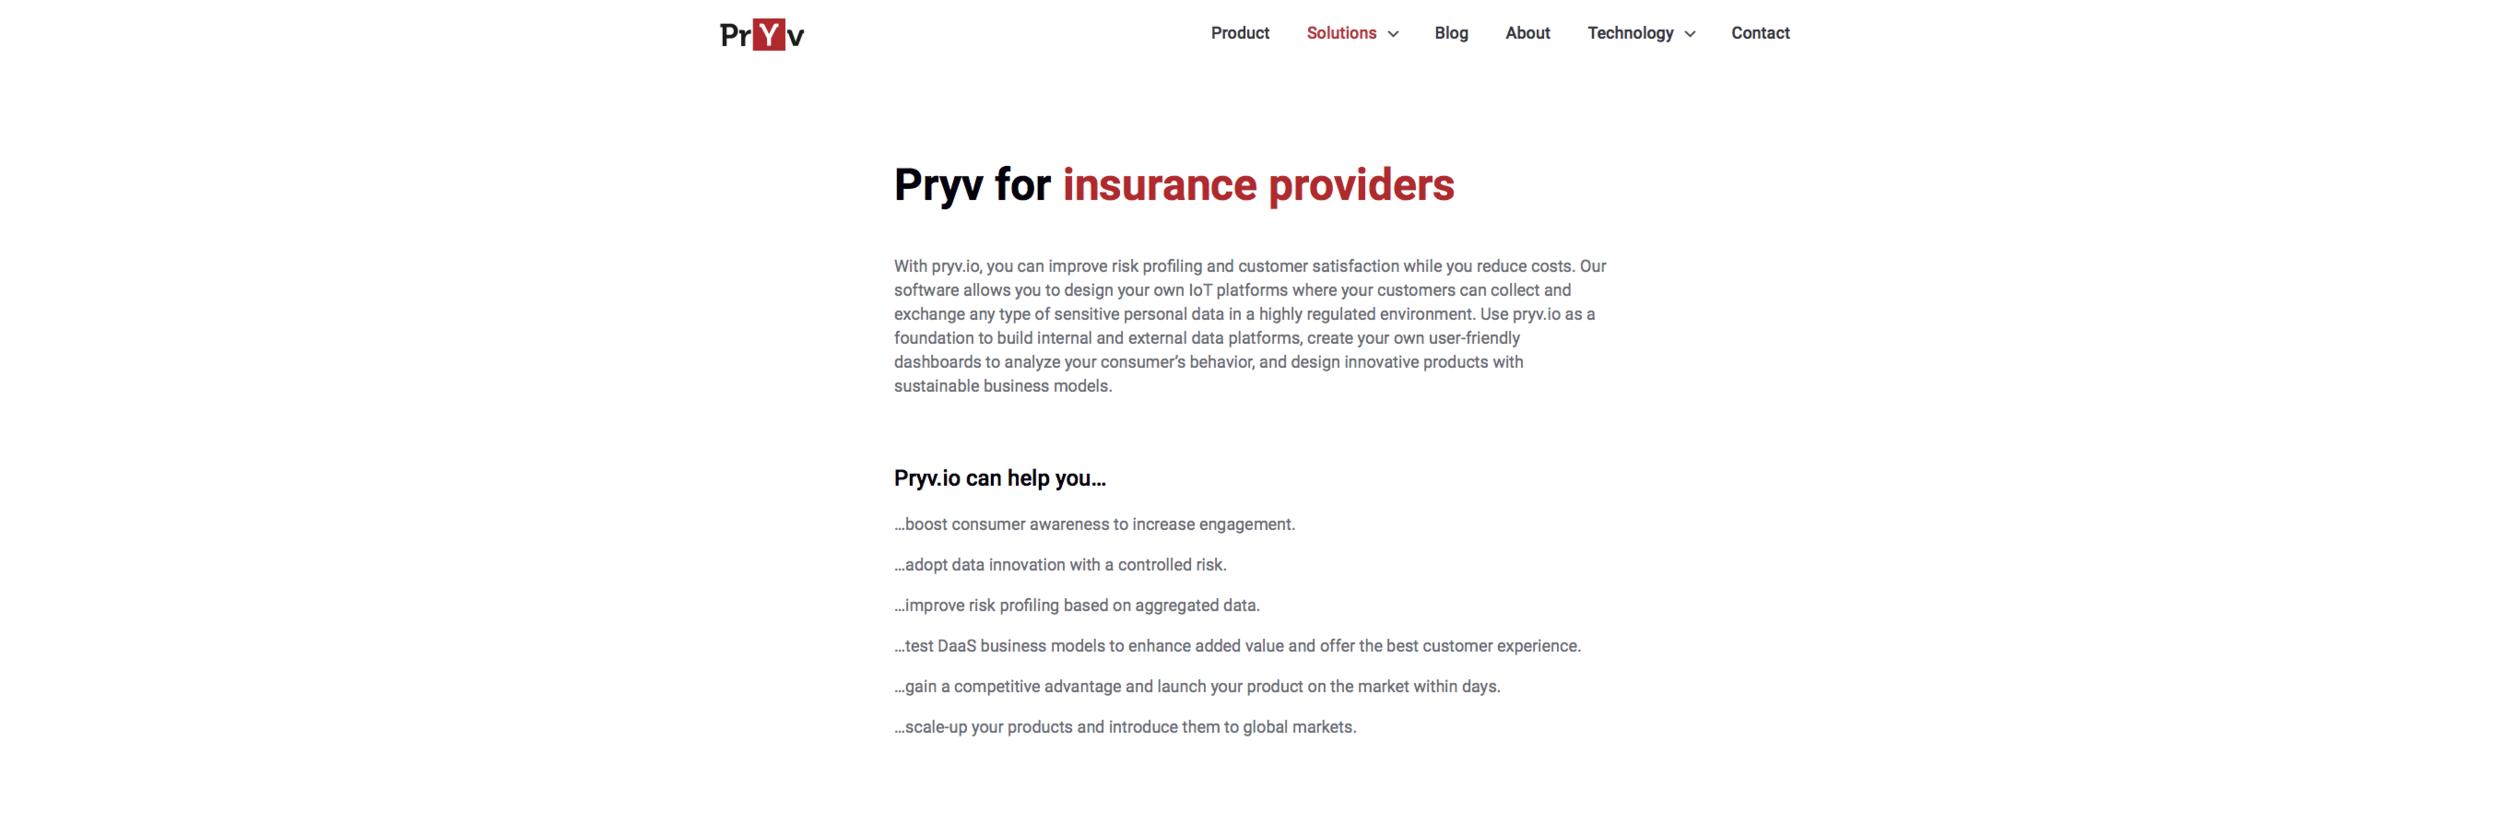 Solutions _ insurance (screenshot).png